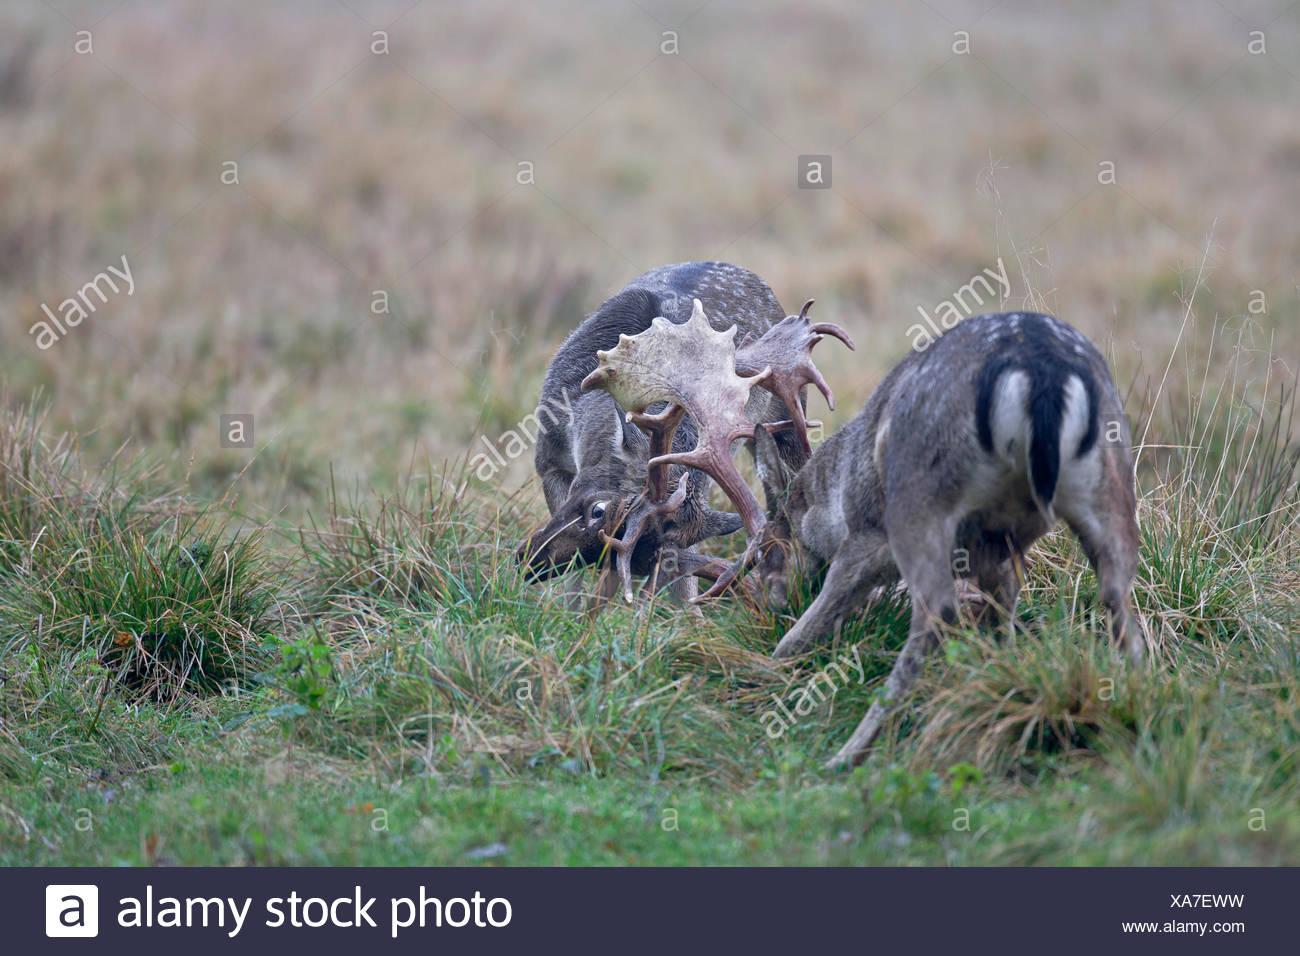 fallow deer (Dama dama, Cervus dama), two stags fighting, Denmark, Sjaelland - Stock Image